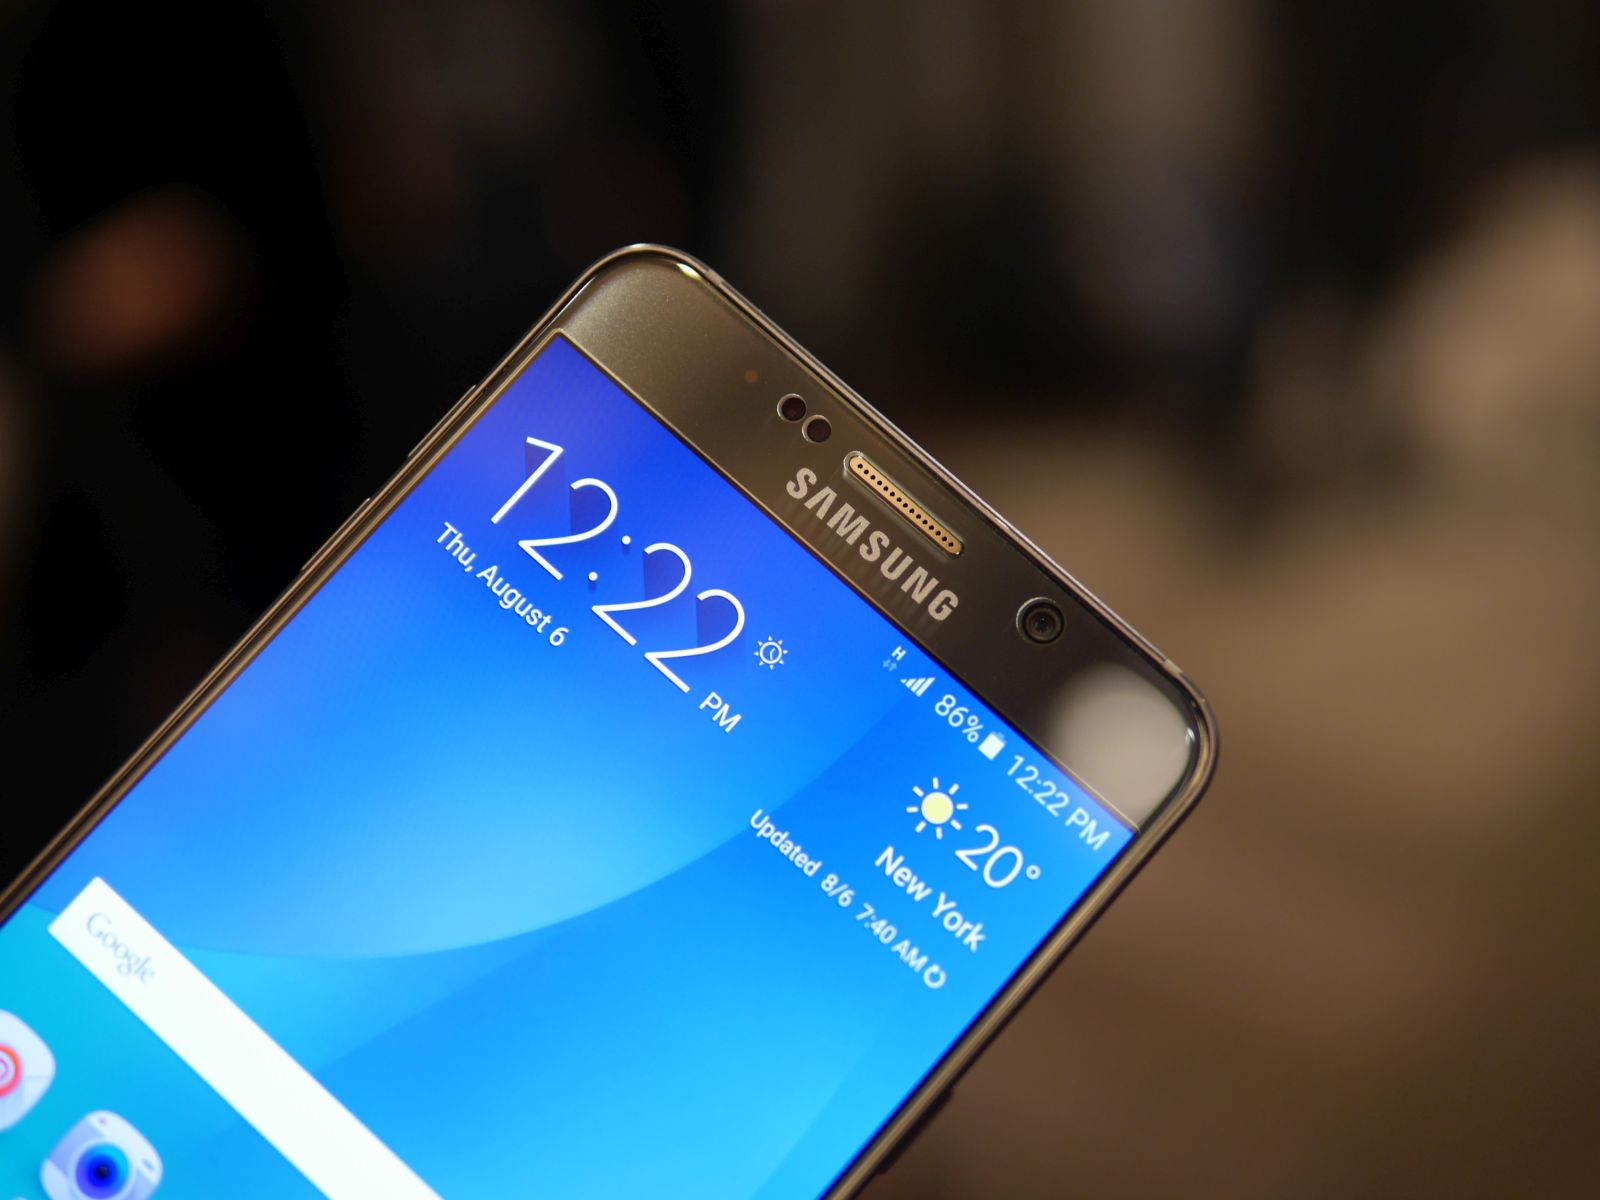 Samsung Galaxy S6 edge Plus 06